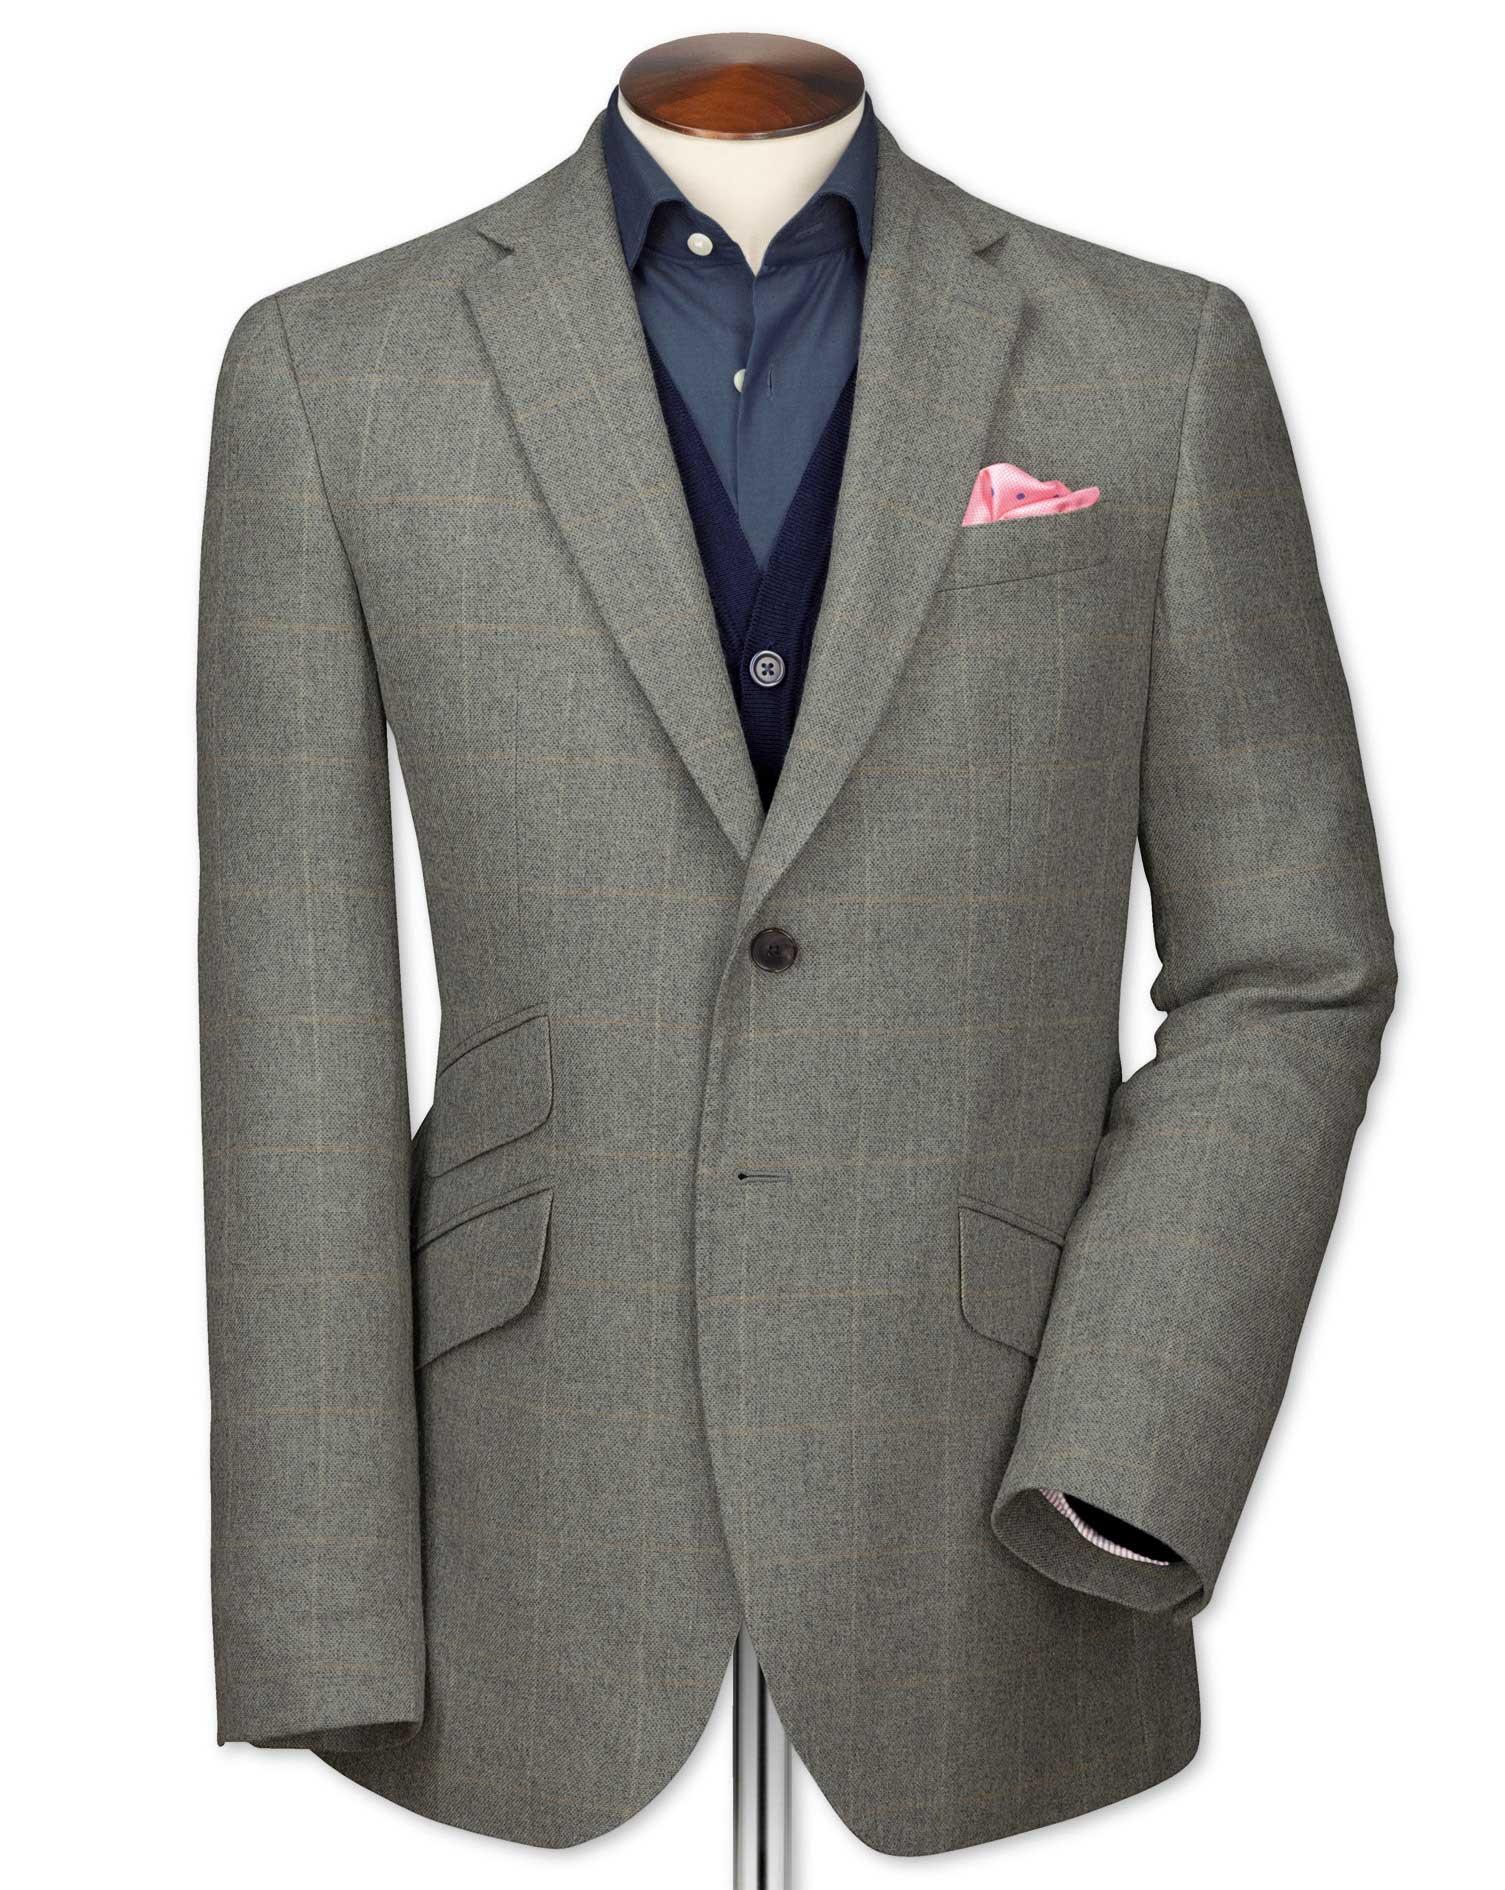 Slim Fit Grey Checkered Luxury Border Tweed Wool Jacket Size 38 Long by Charles Tyrwhitt